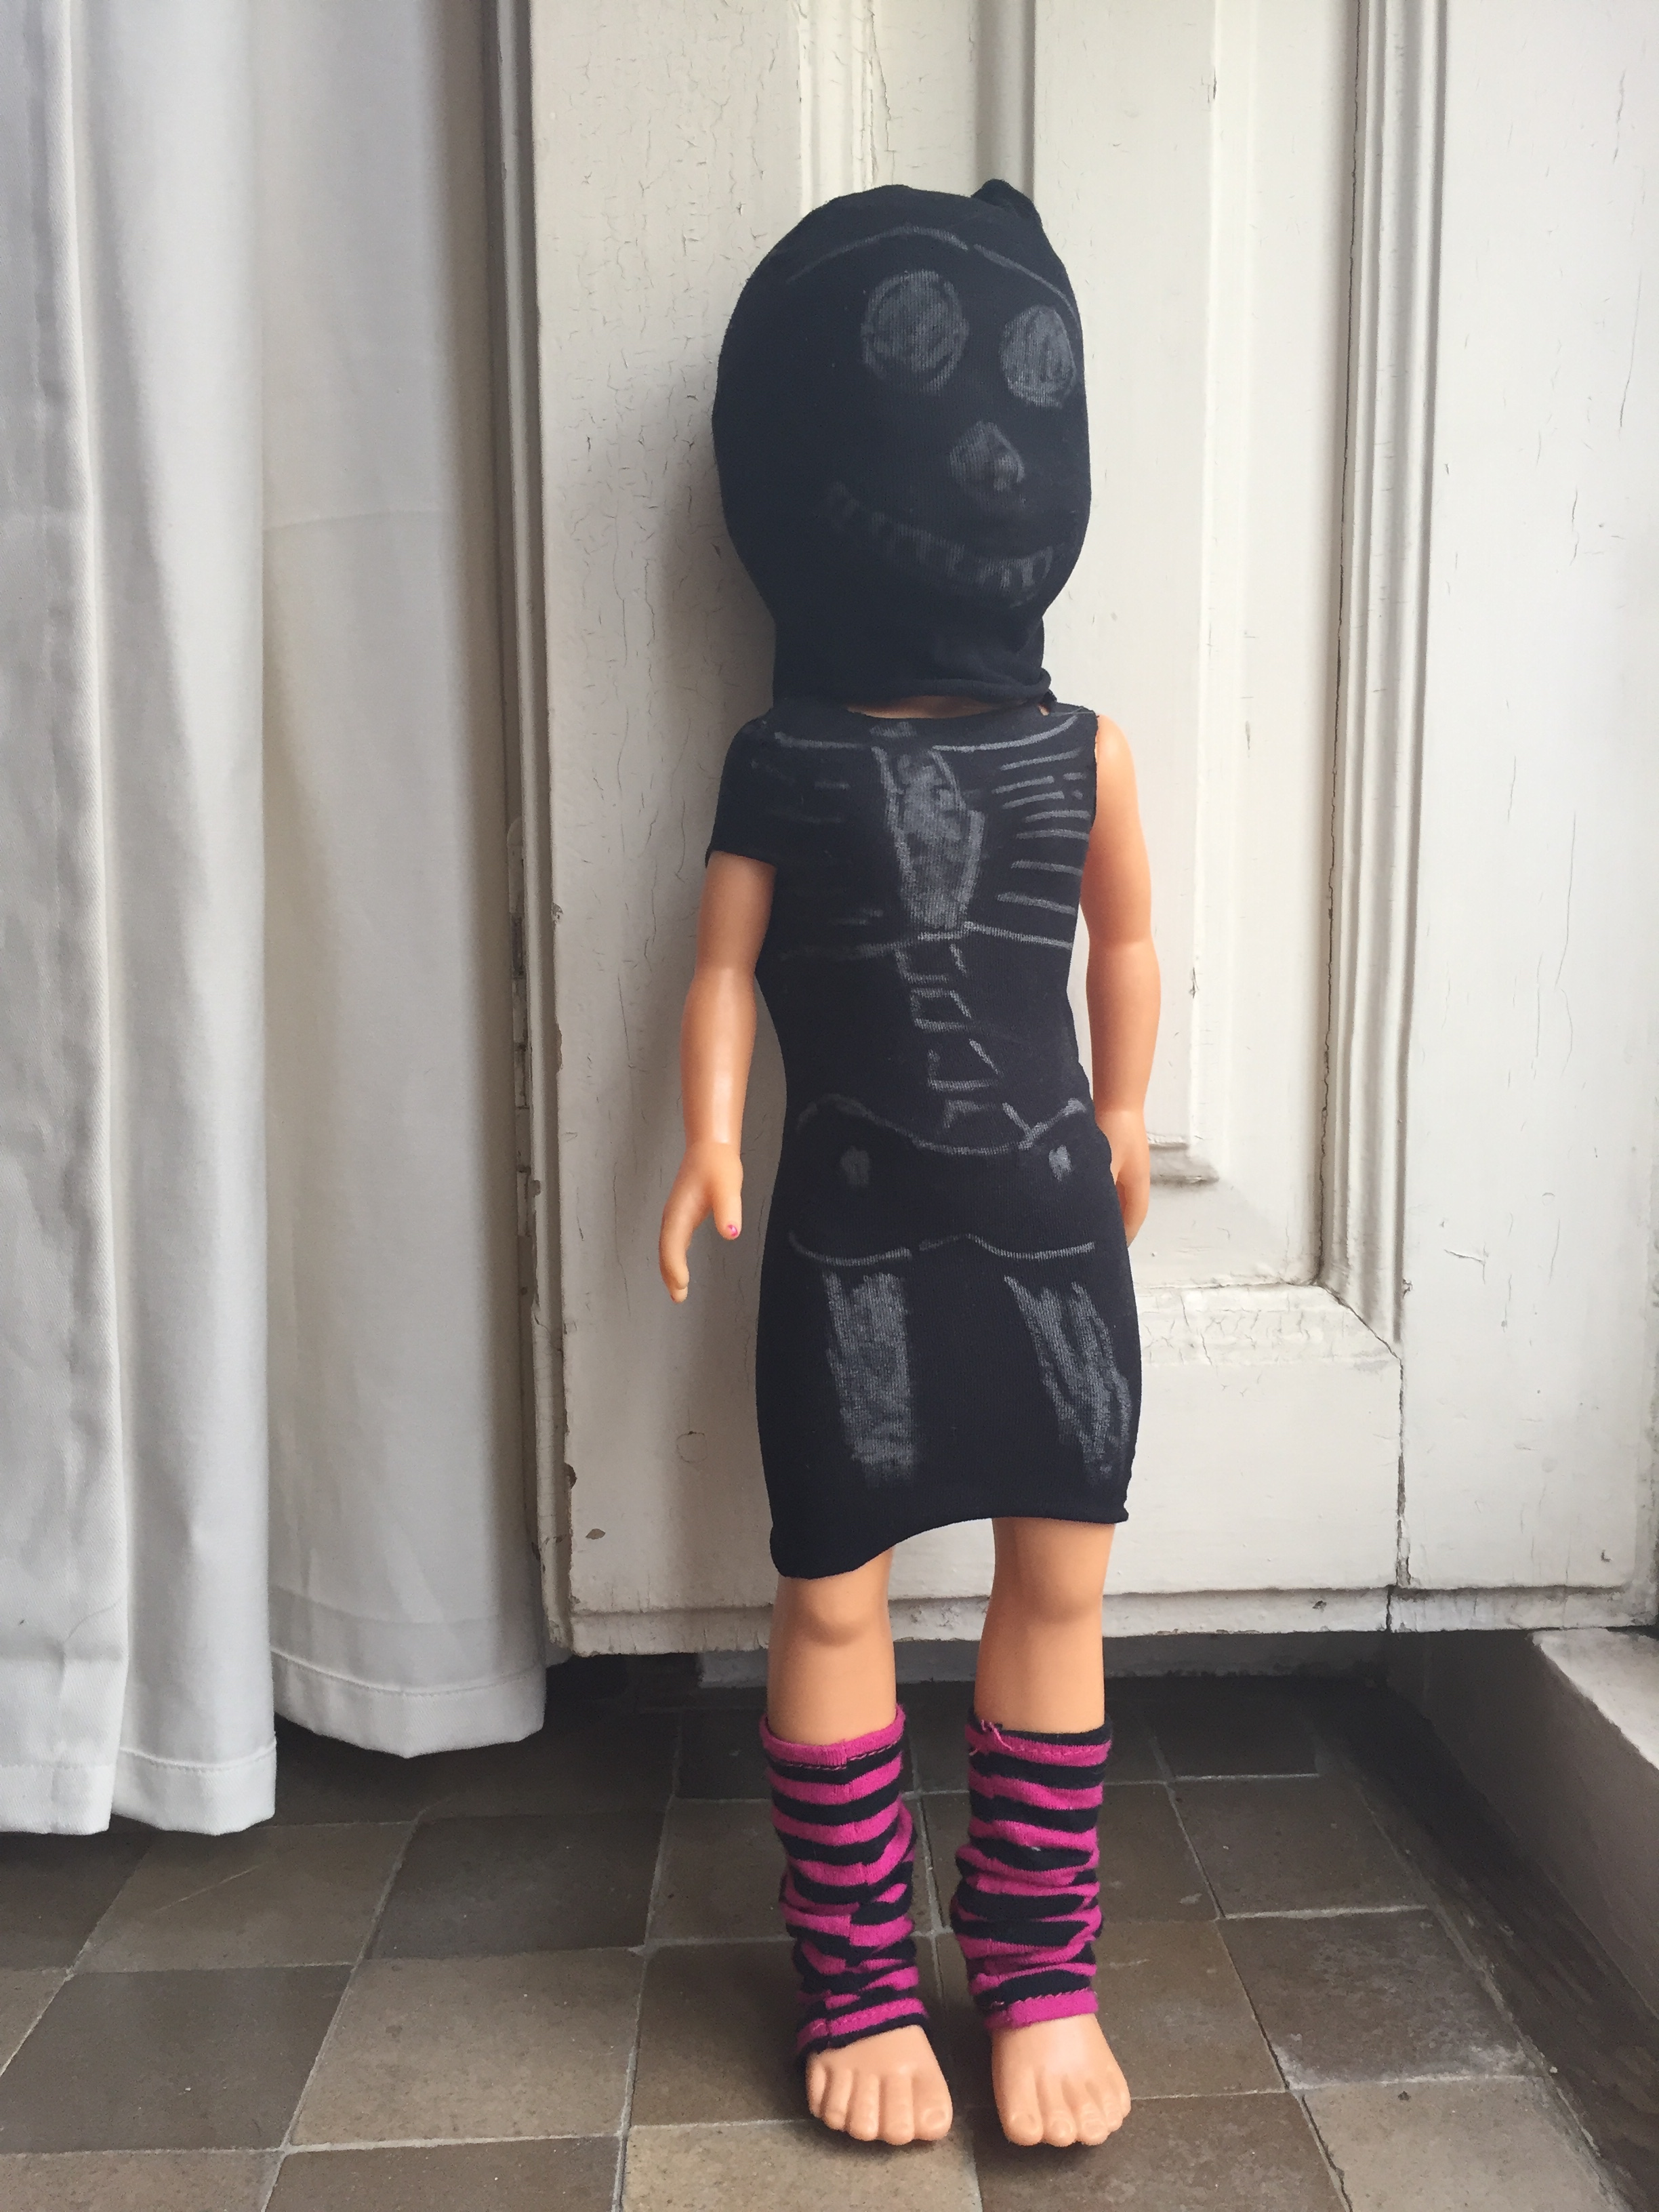 halloween-disfraz-doll-muneco-costum-kostuem-puppe-diy-basteln-manualidad-selber-machen-alte-strumpfhose-pantys-calcetines